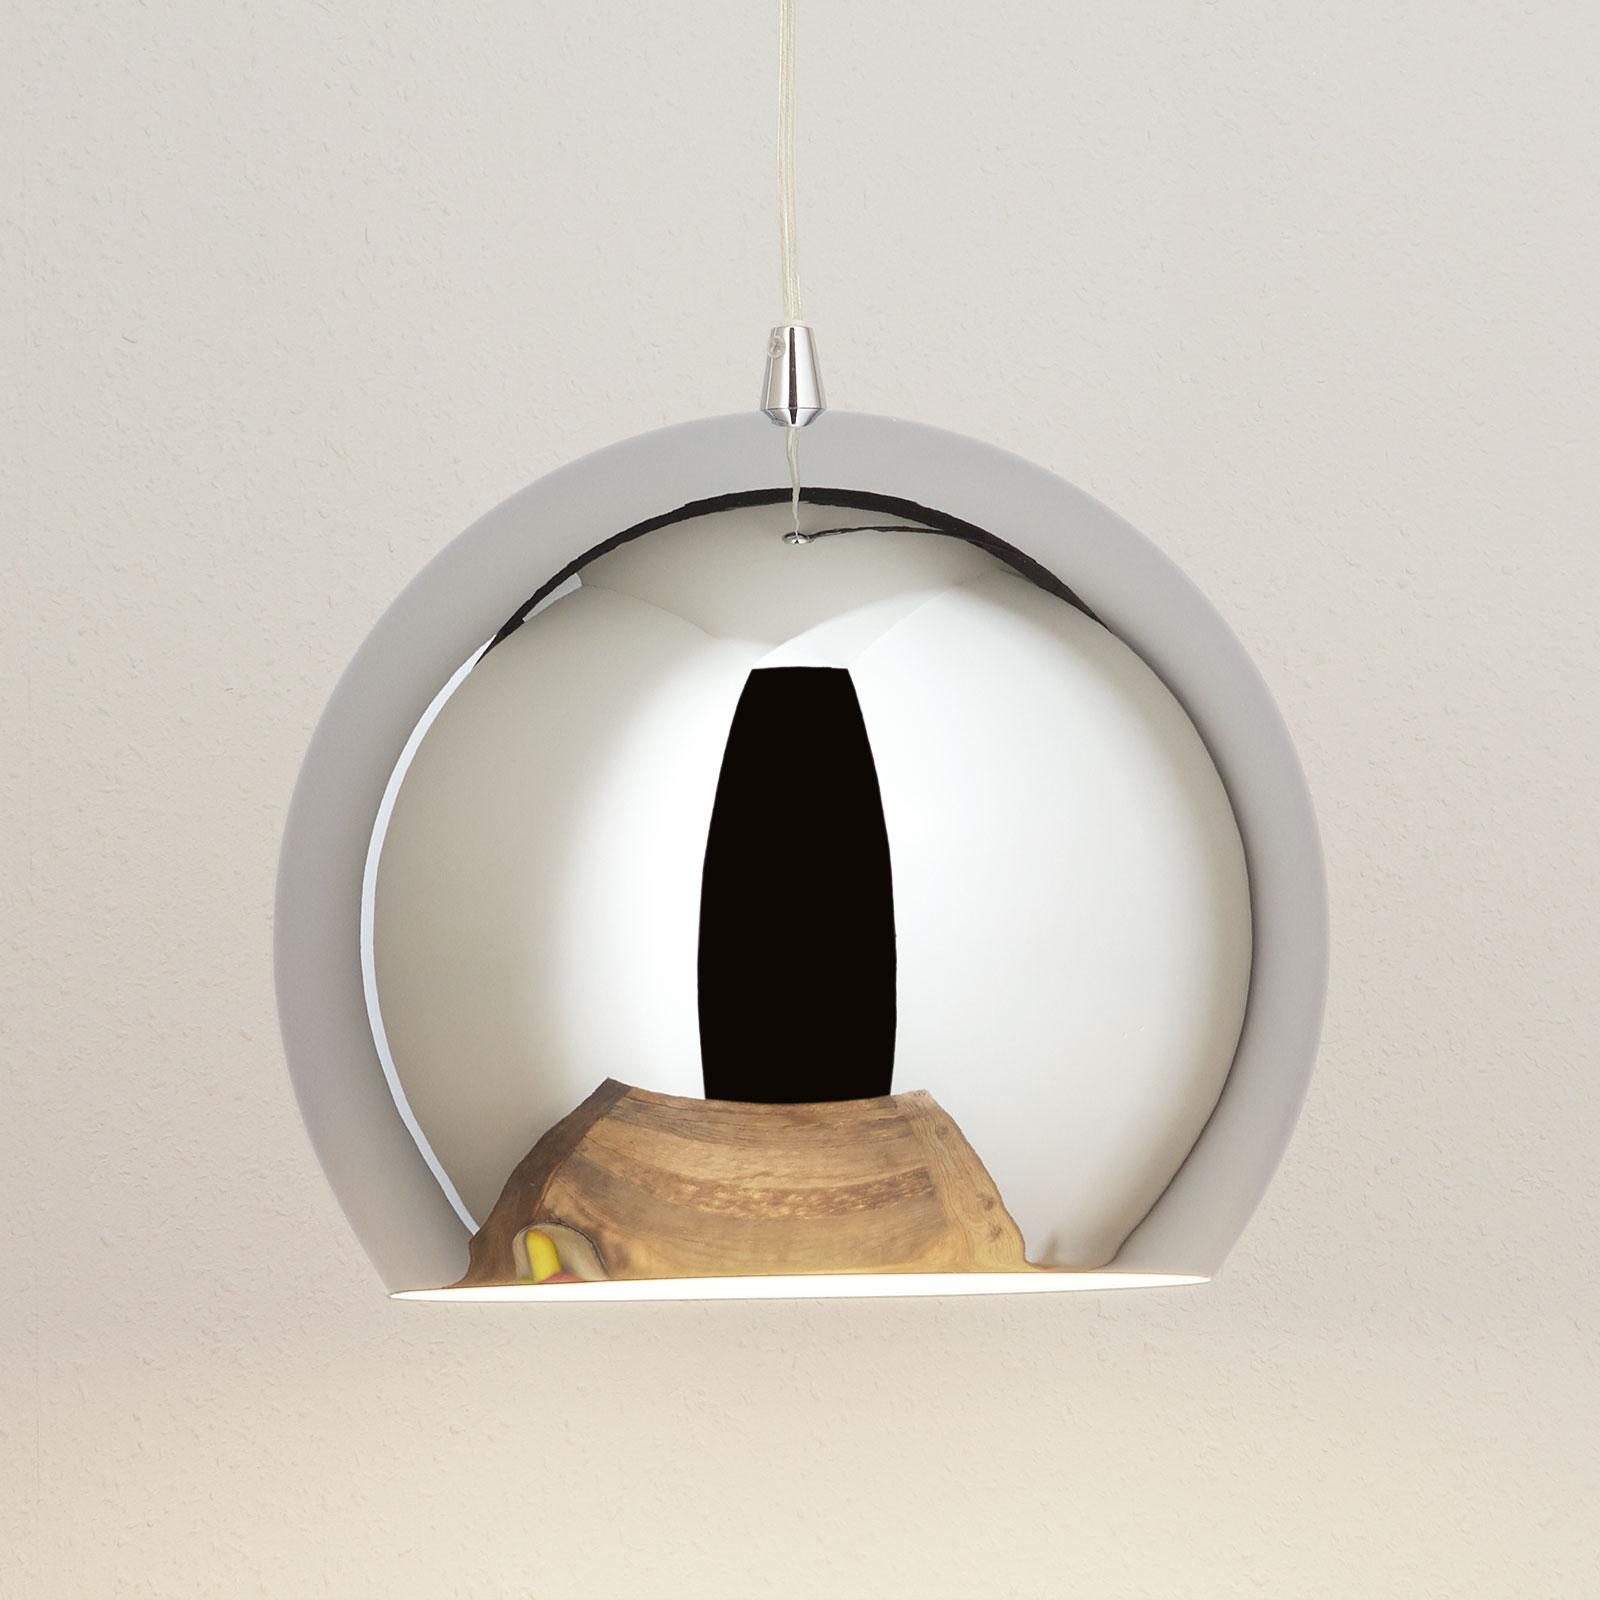 Lampa wisząca BULLE, chrom